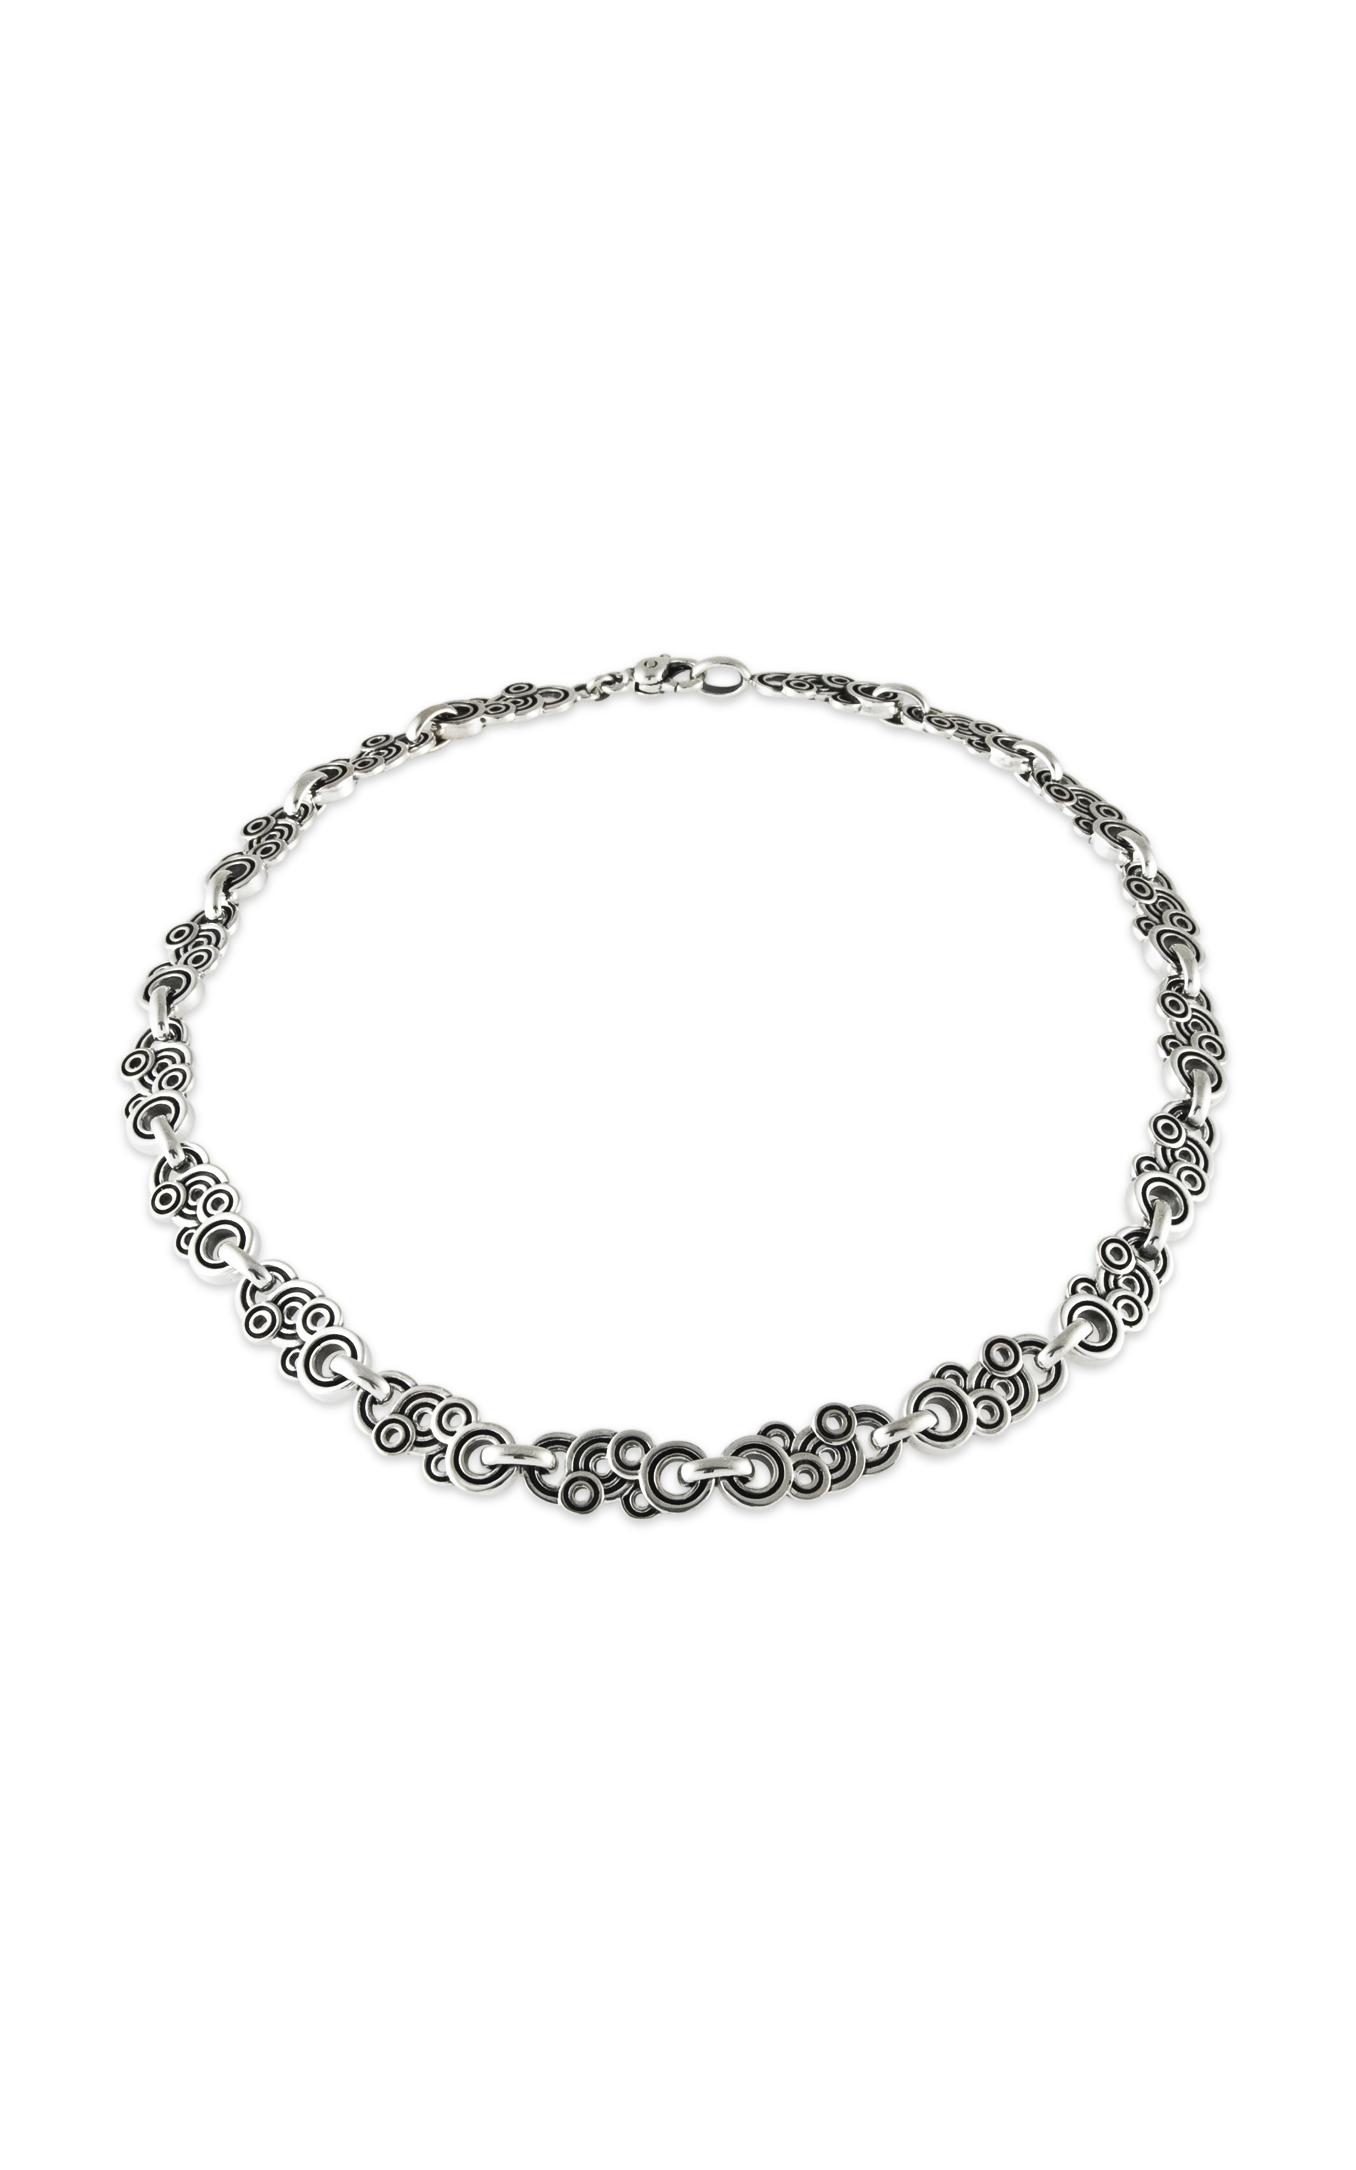 Zina Spiralz Necklace A1975-17 product image